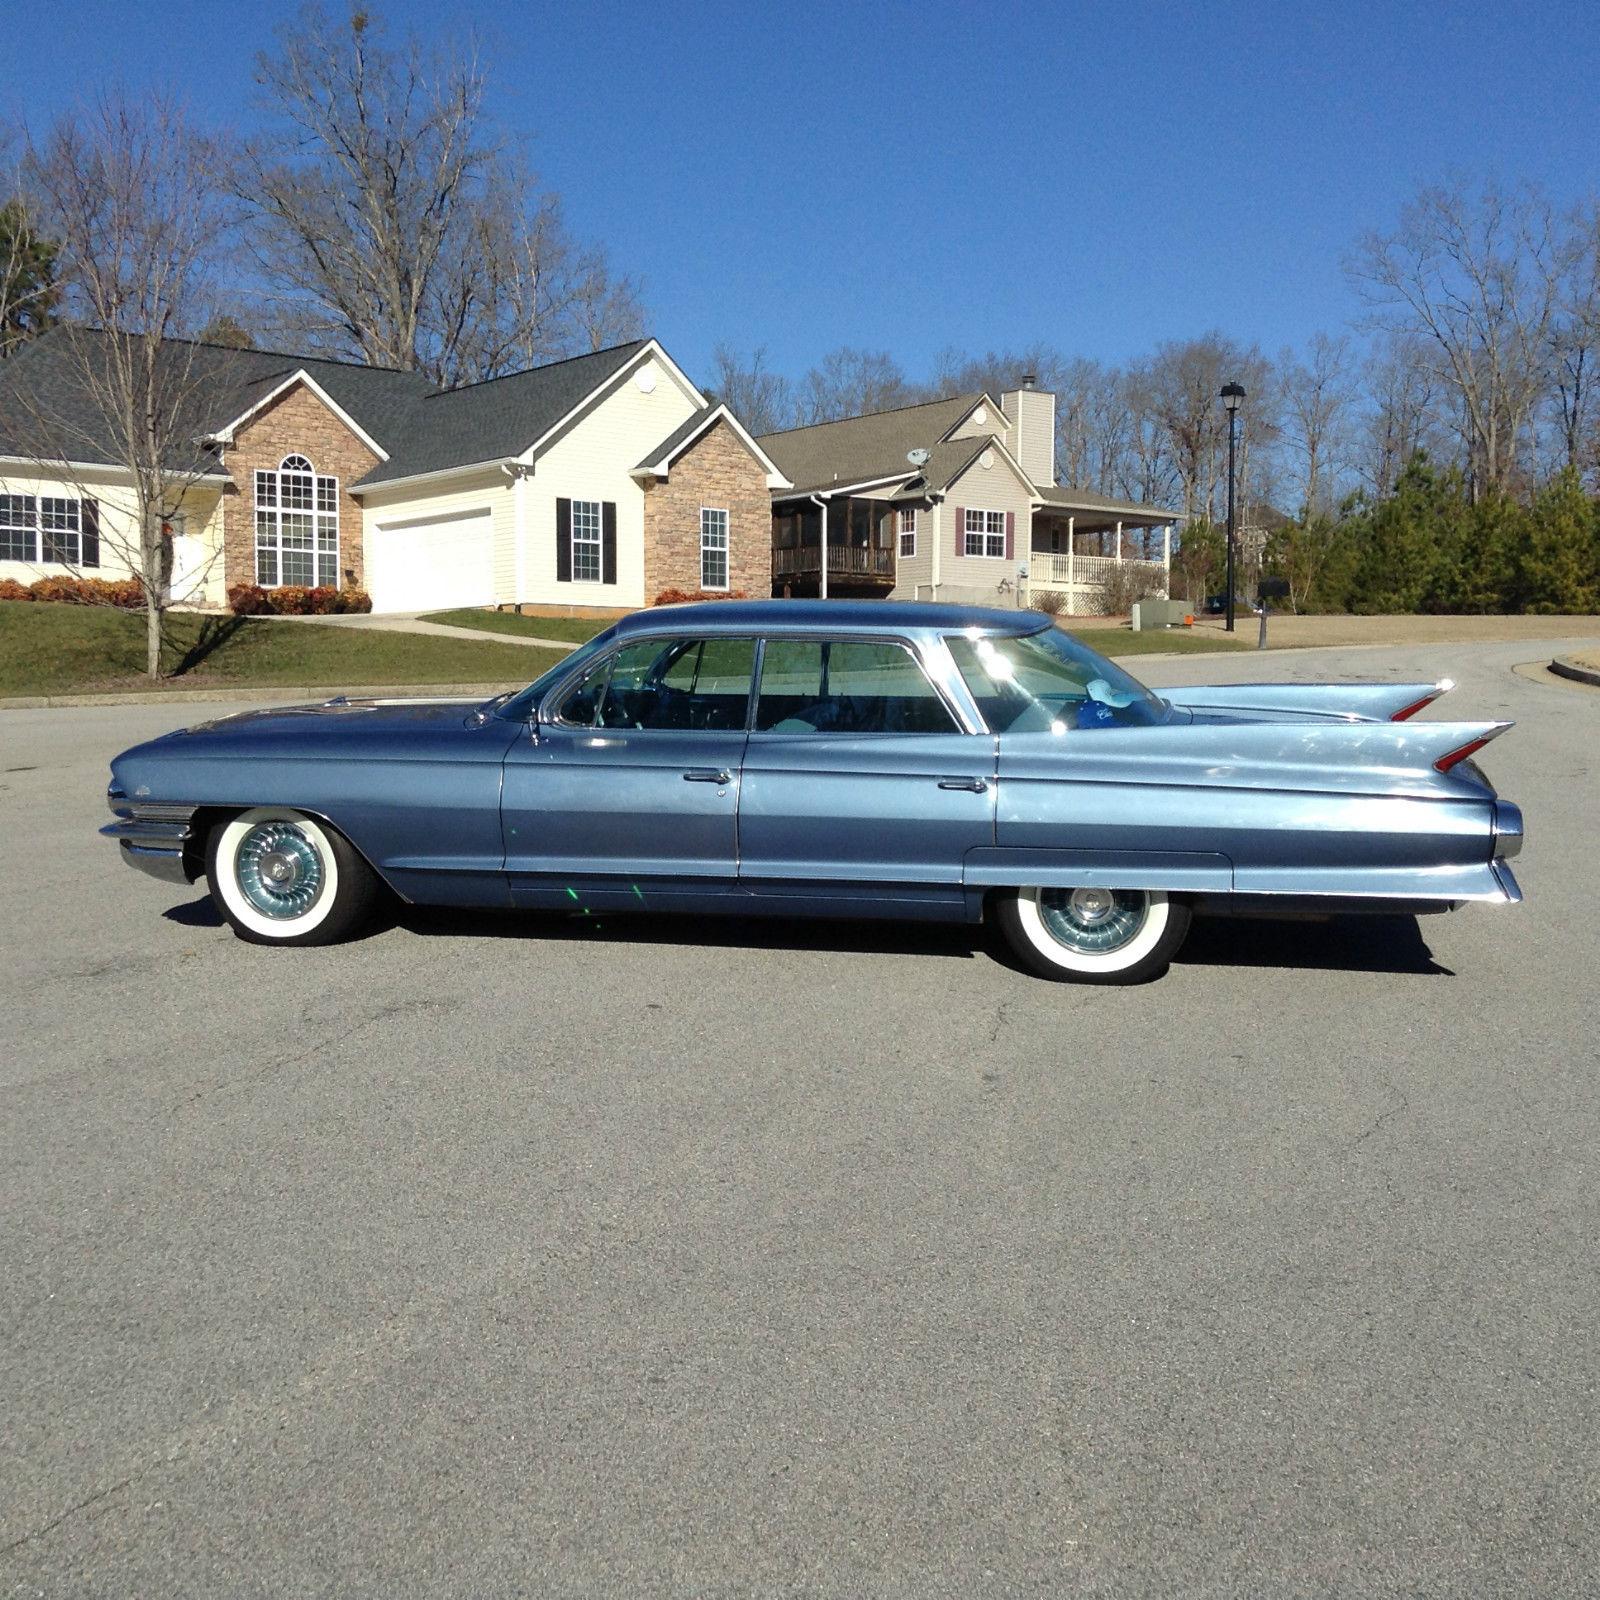 1961 Cadillac Sedan DeVille 4 Window For Sale In